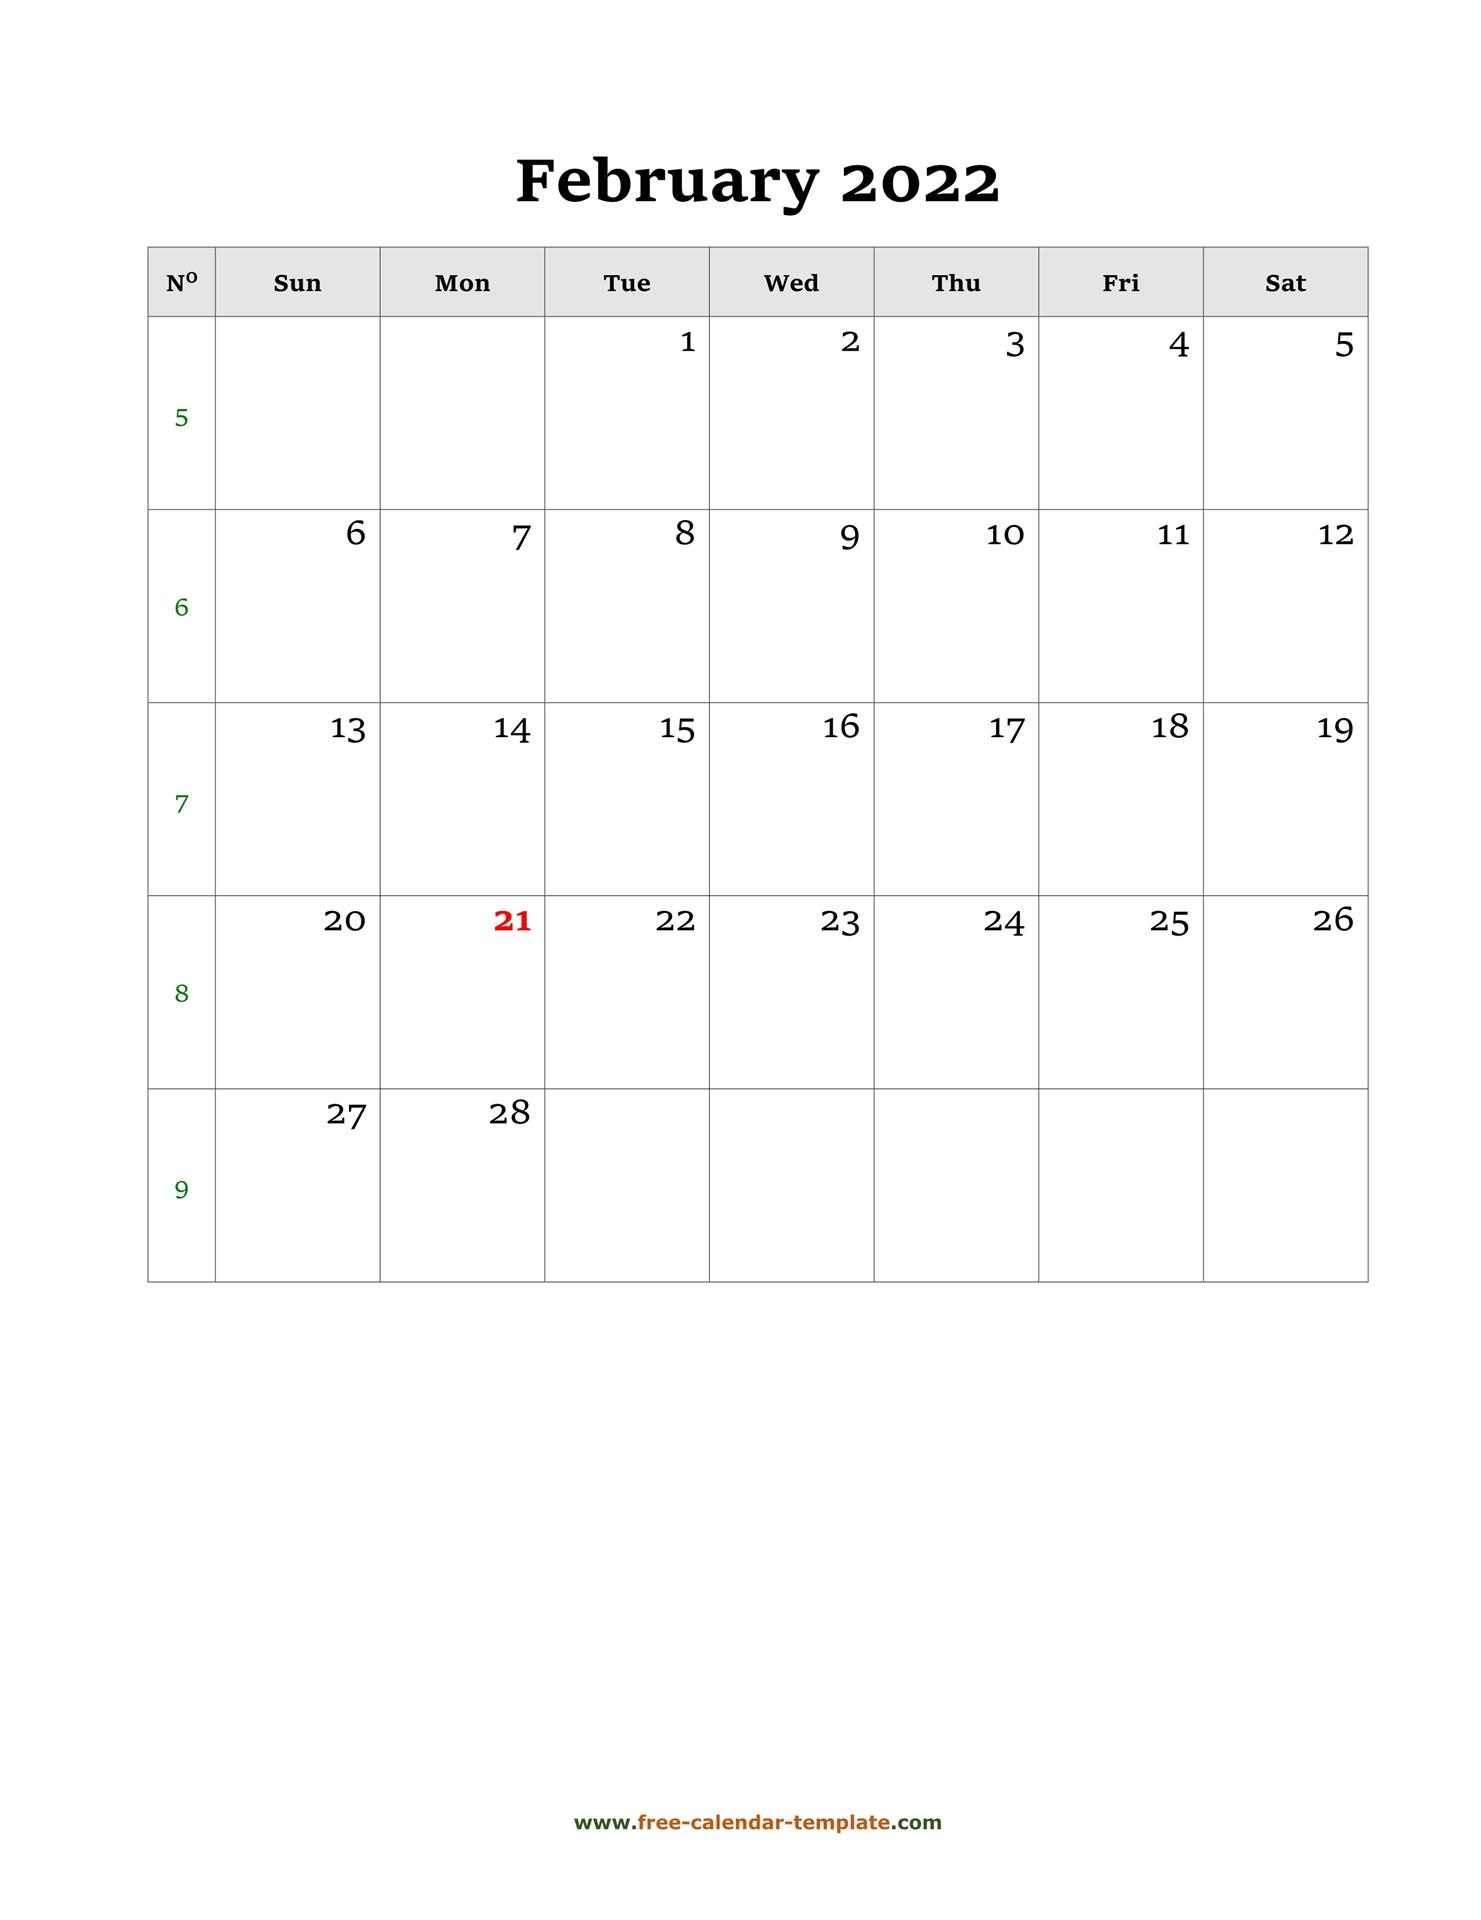 February 2022 Free Calendar Tempplate | Free-Calendar for Free Printable Calendar Templates February 2022